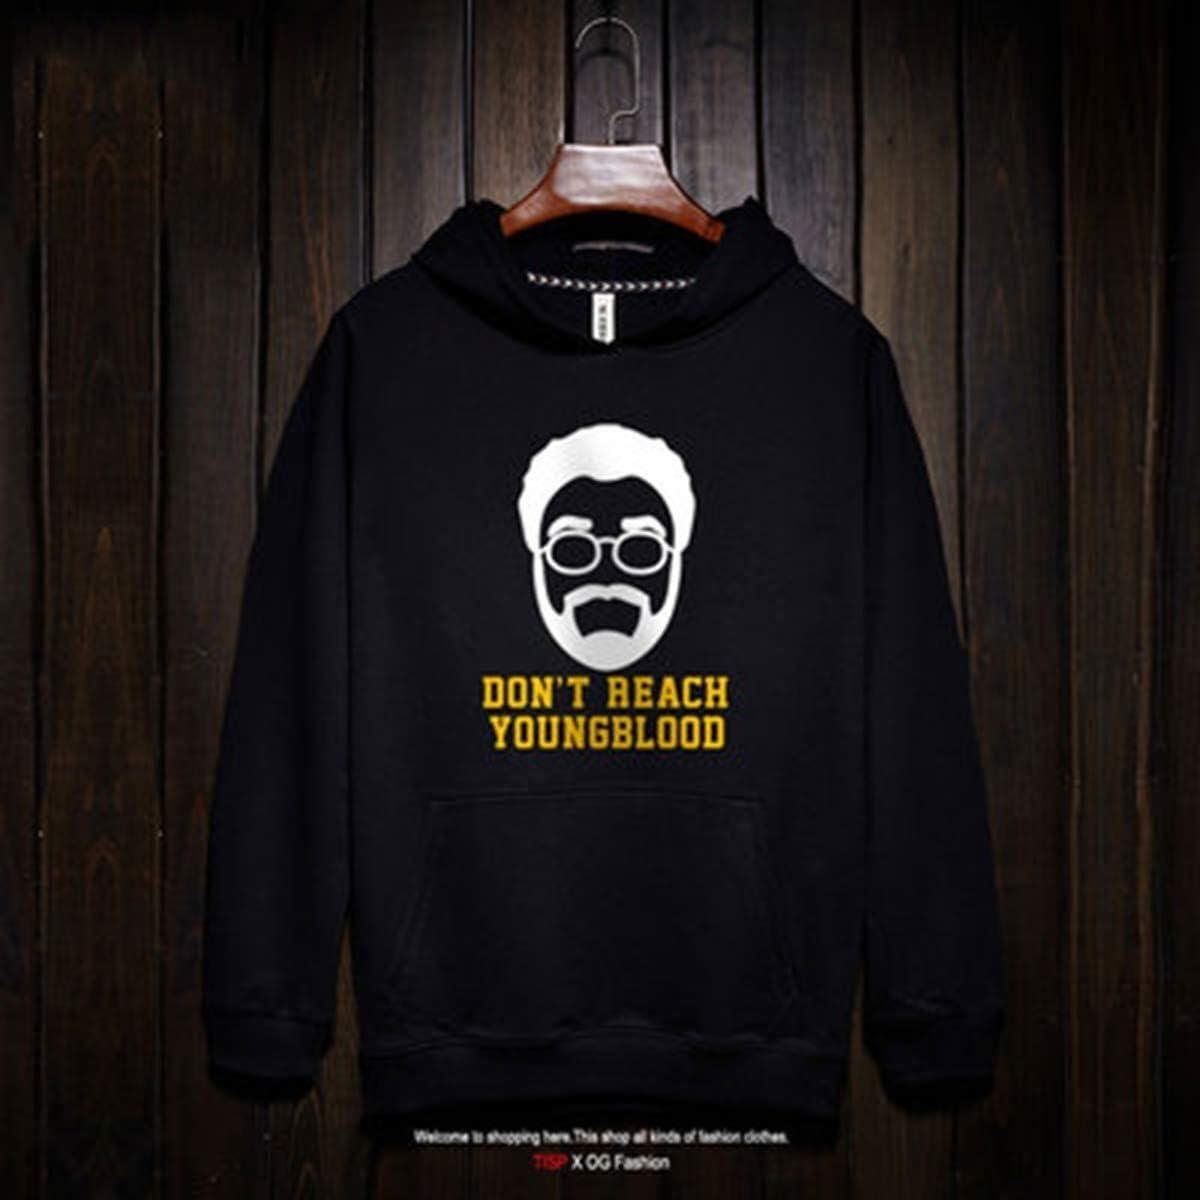 Fan-Moda Hombres Sudadera celtas/tío dibujó Baloncesto Jersey con Capucha Moda Sudadera Pullover Camiseta for niños pequeños Sudadera con Capucha de Baloncesto (Color : A, Size : XXL): Amazon.es: Hogar